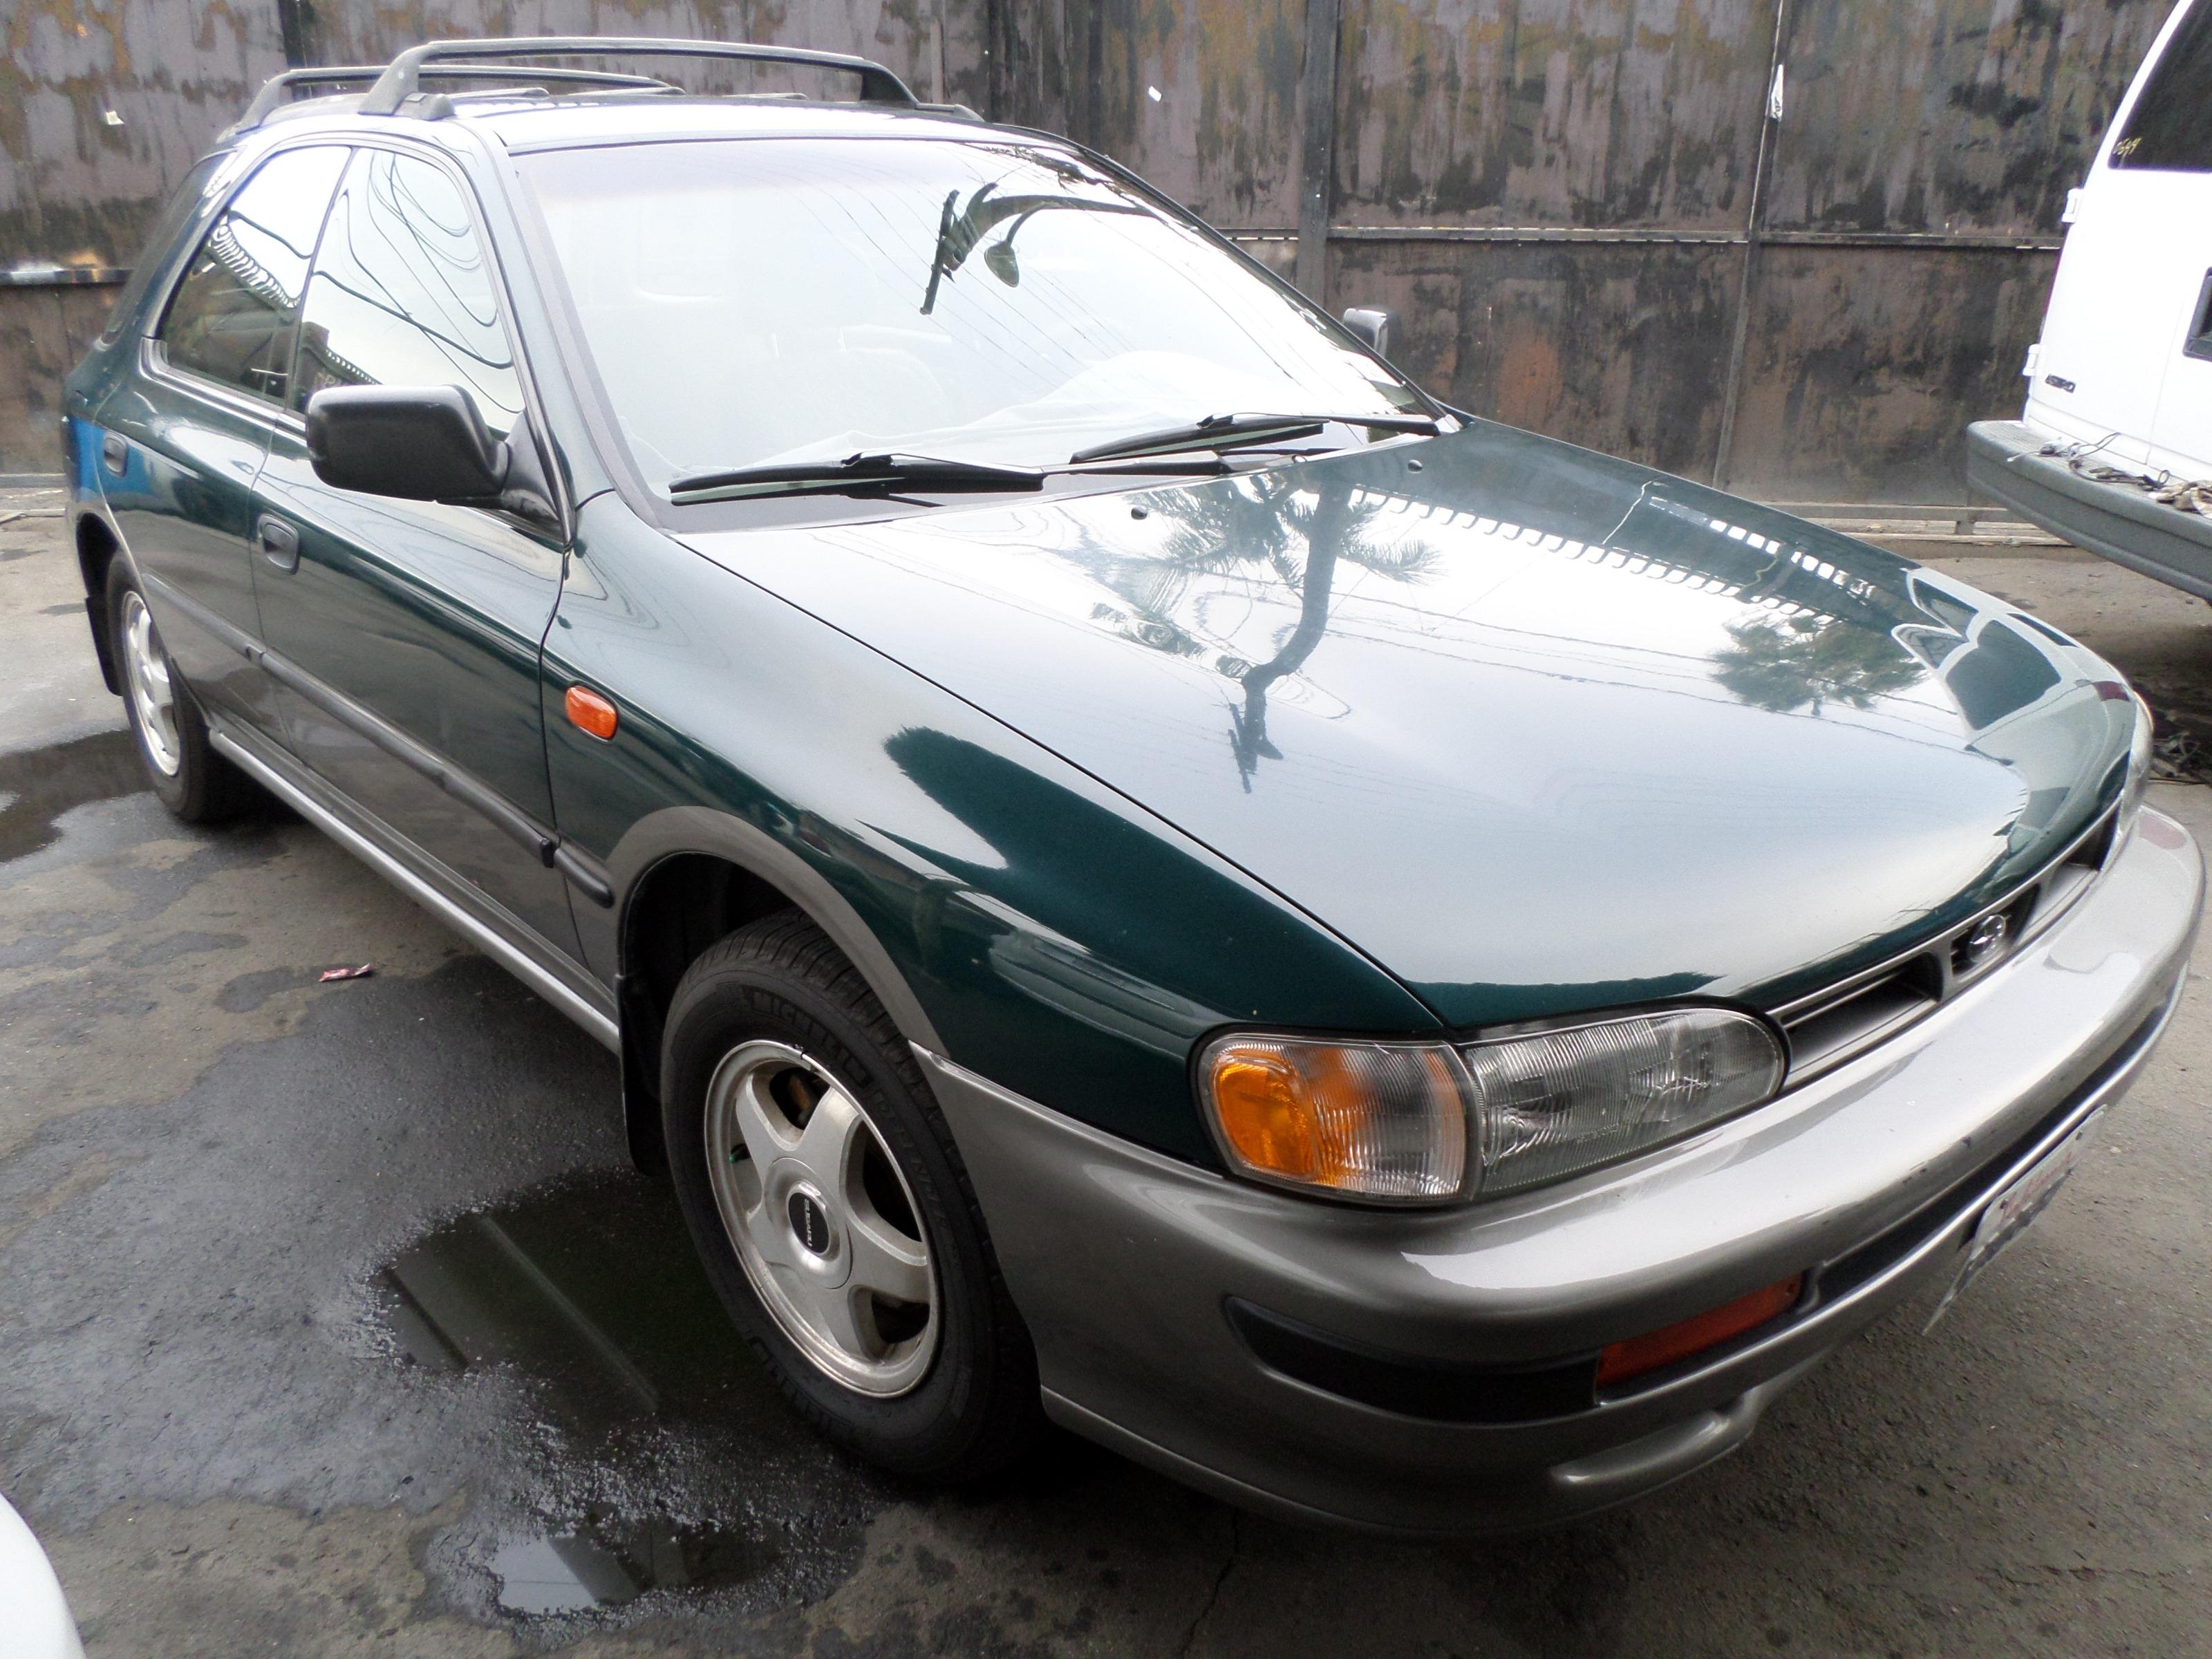 1996 Subaru Impreza Wagon 5dr Wgn Outback Manual w/ES Equip